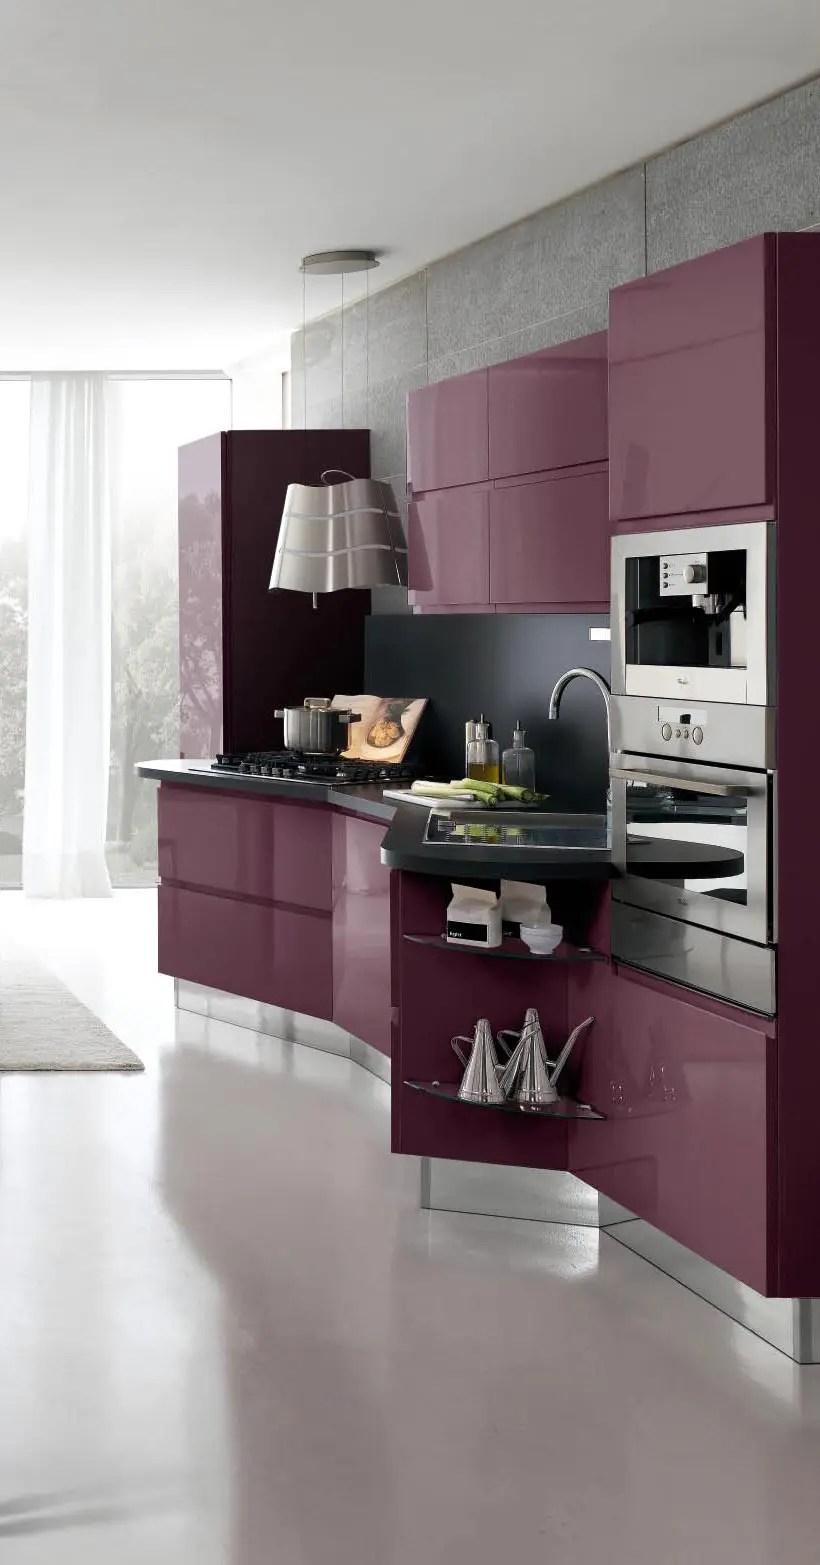 New Modern Kitchen Design With White Cabinets Bring